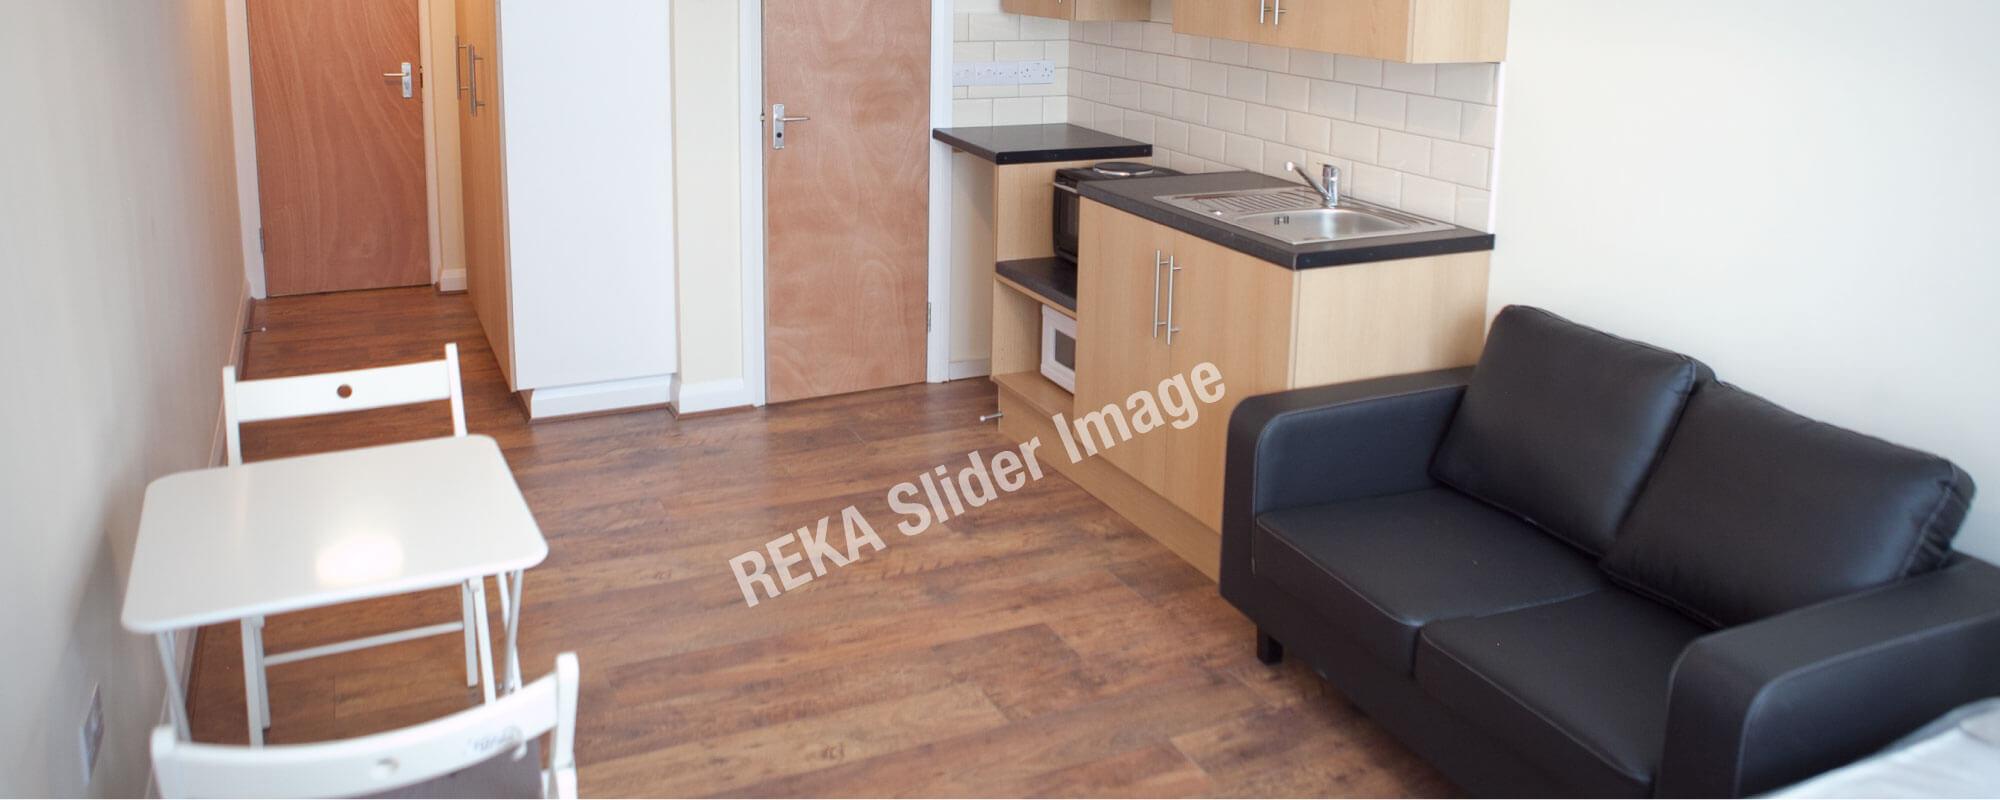 reka slider image - Gallery